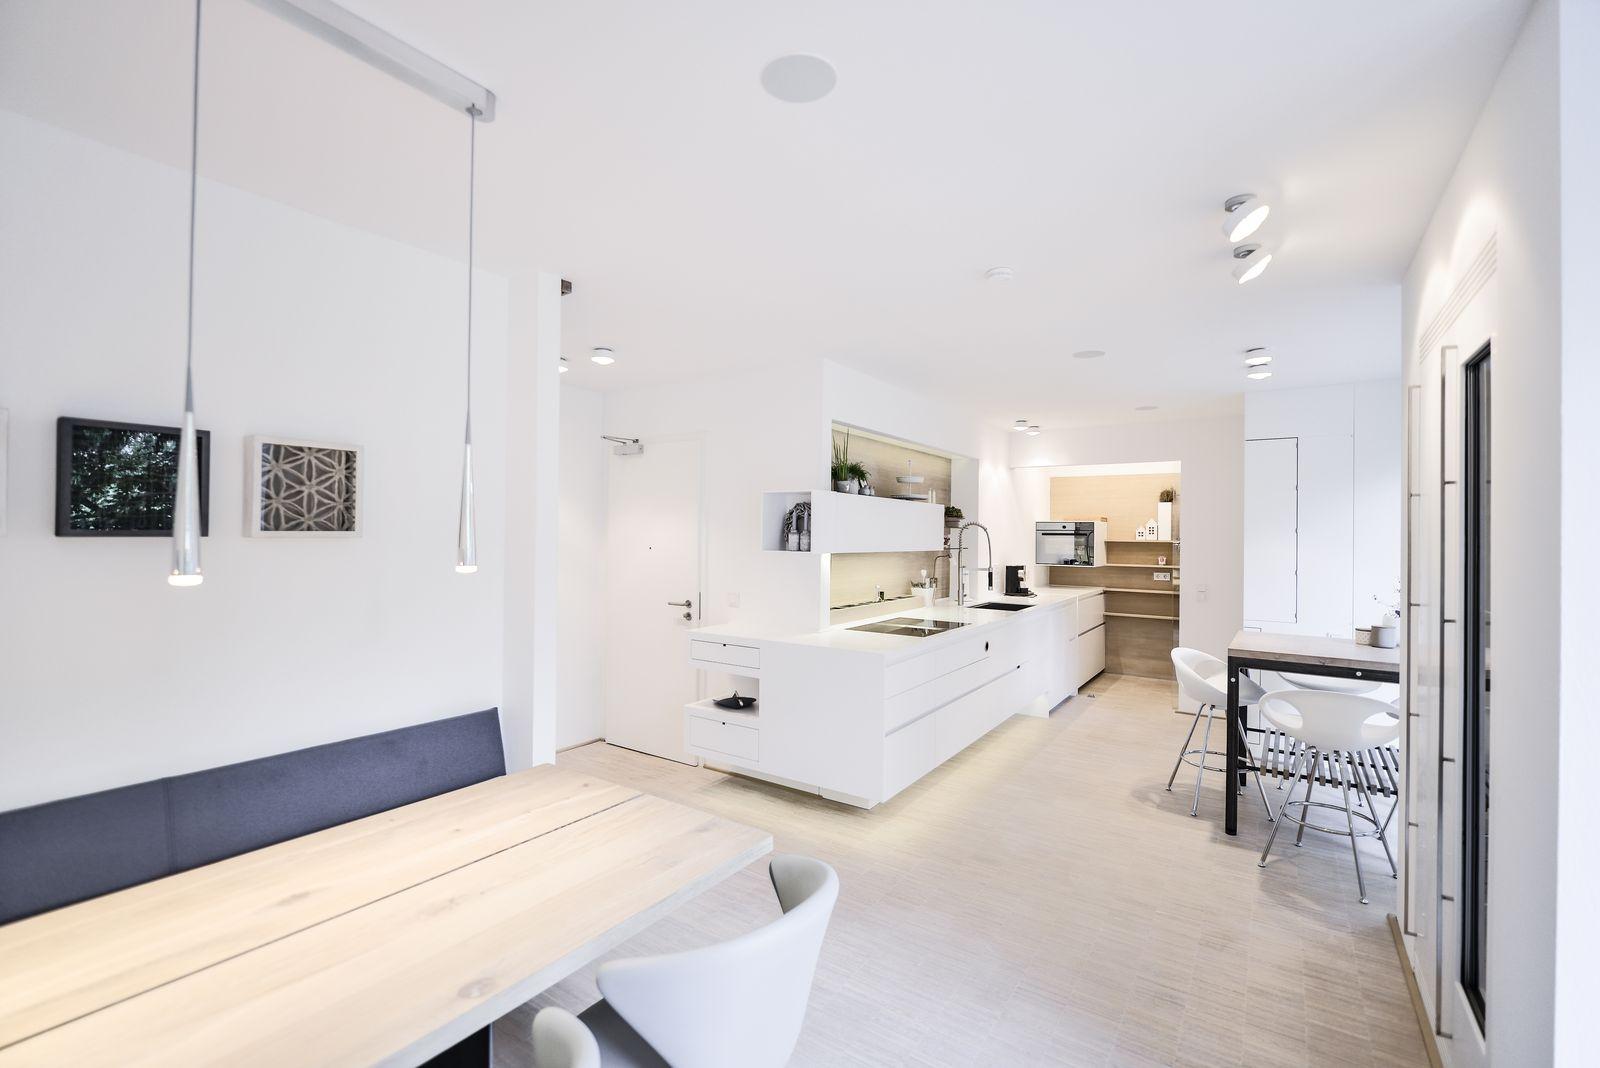 plan 3 kitchens / Renovation of an above-ground bunker in Siegen / Apartment W